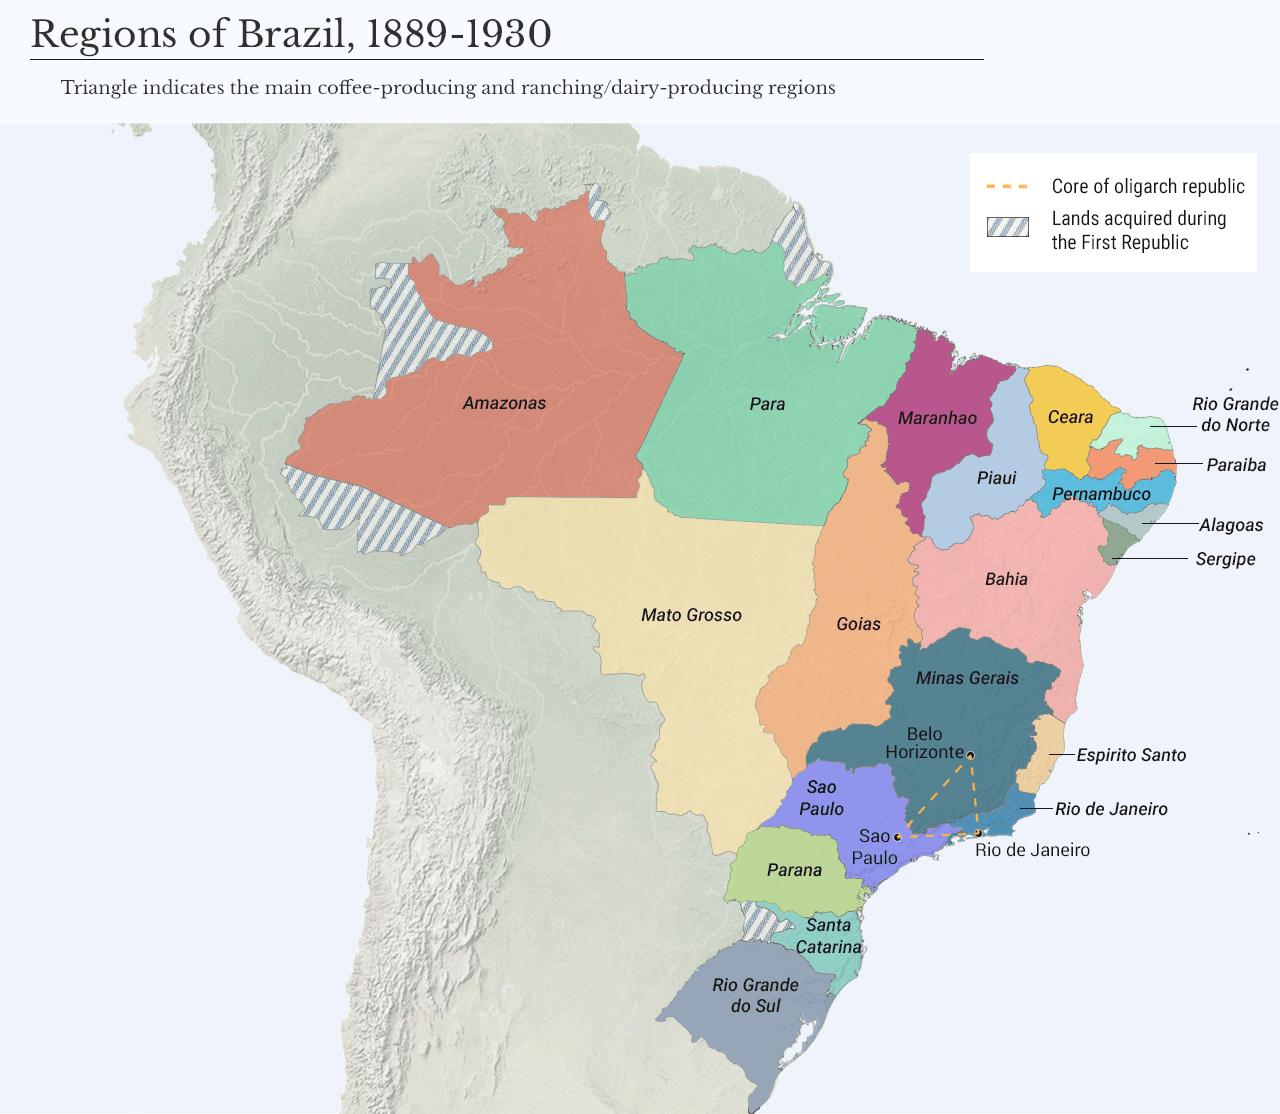 Brazil-Regions-1889-1930_map